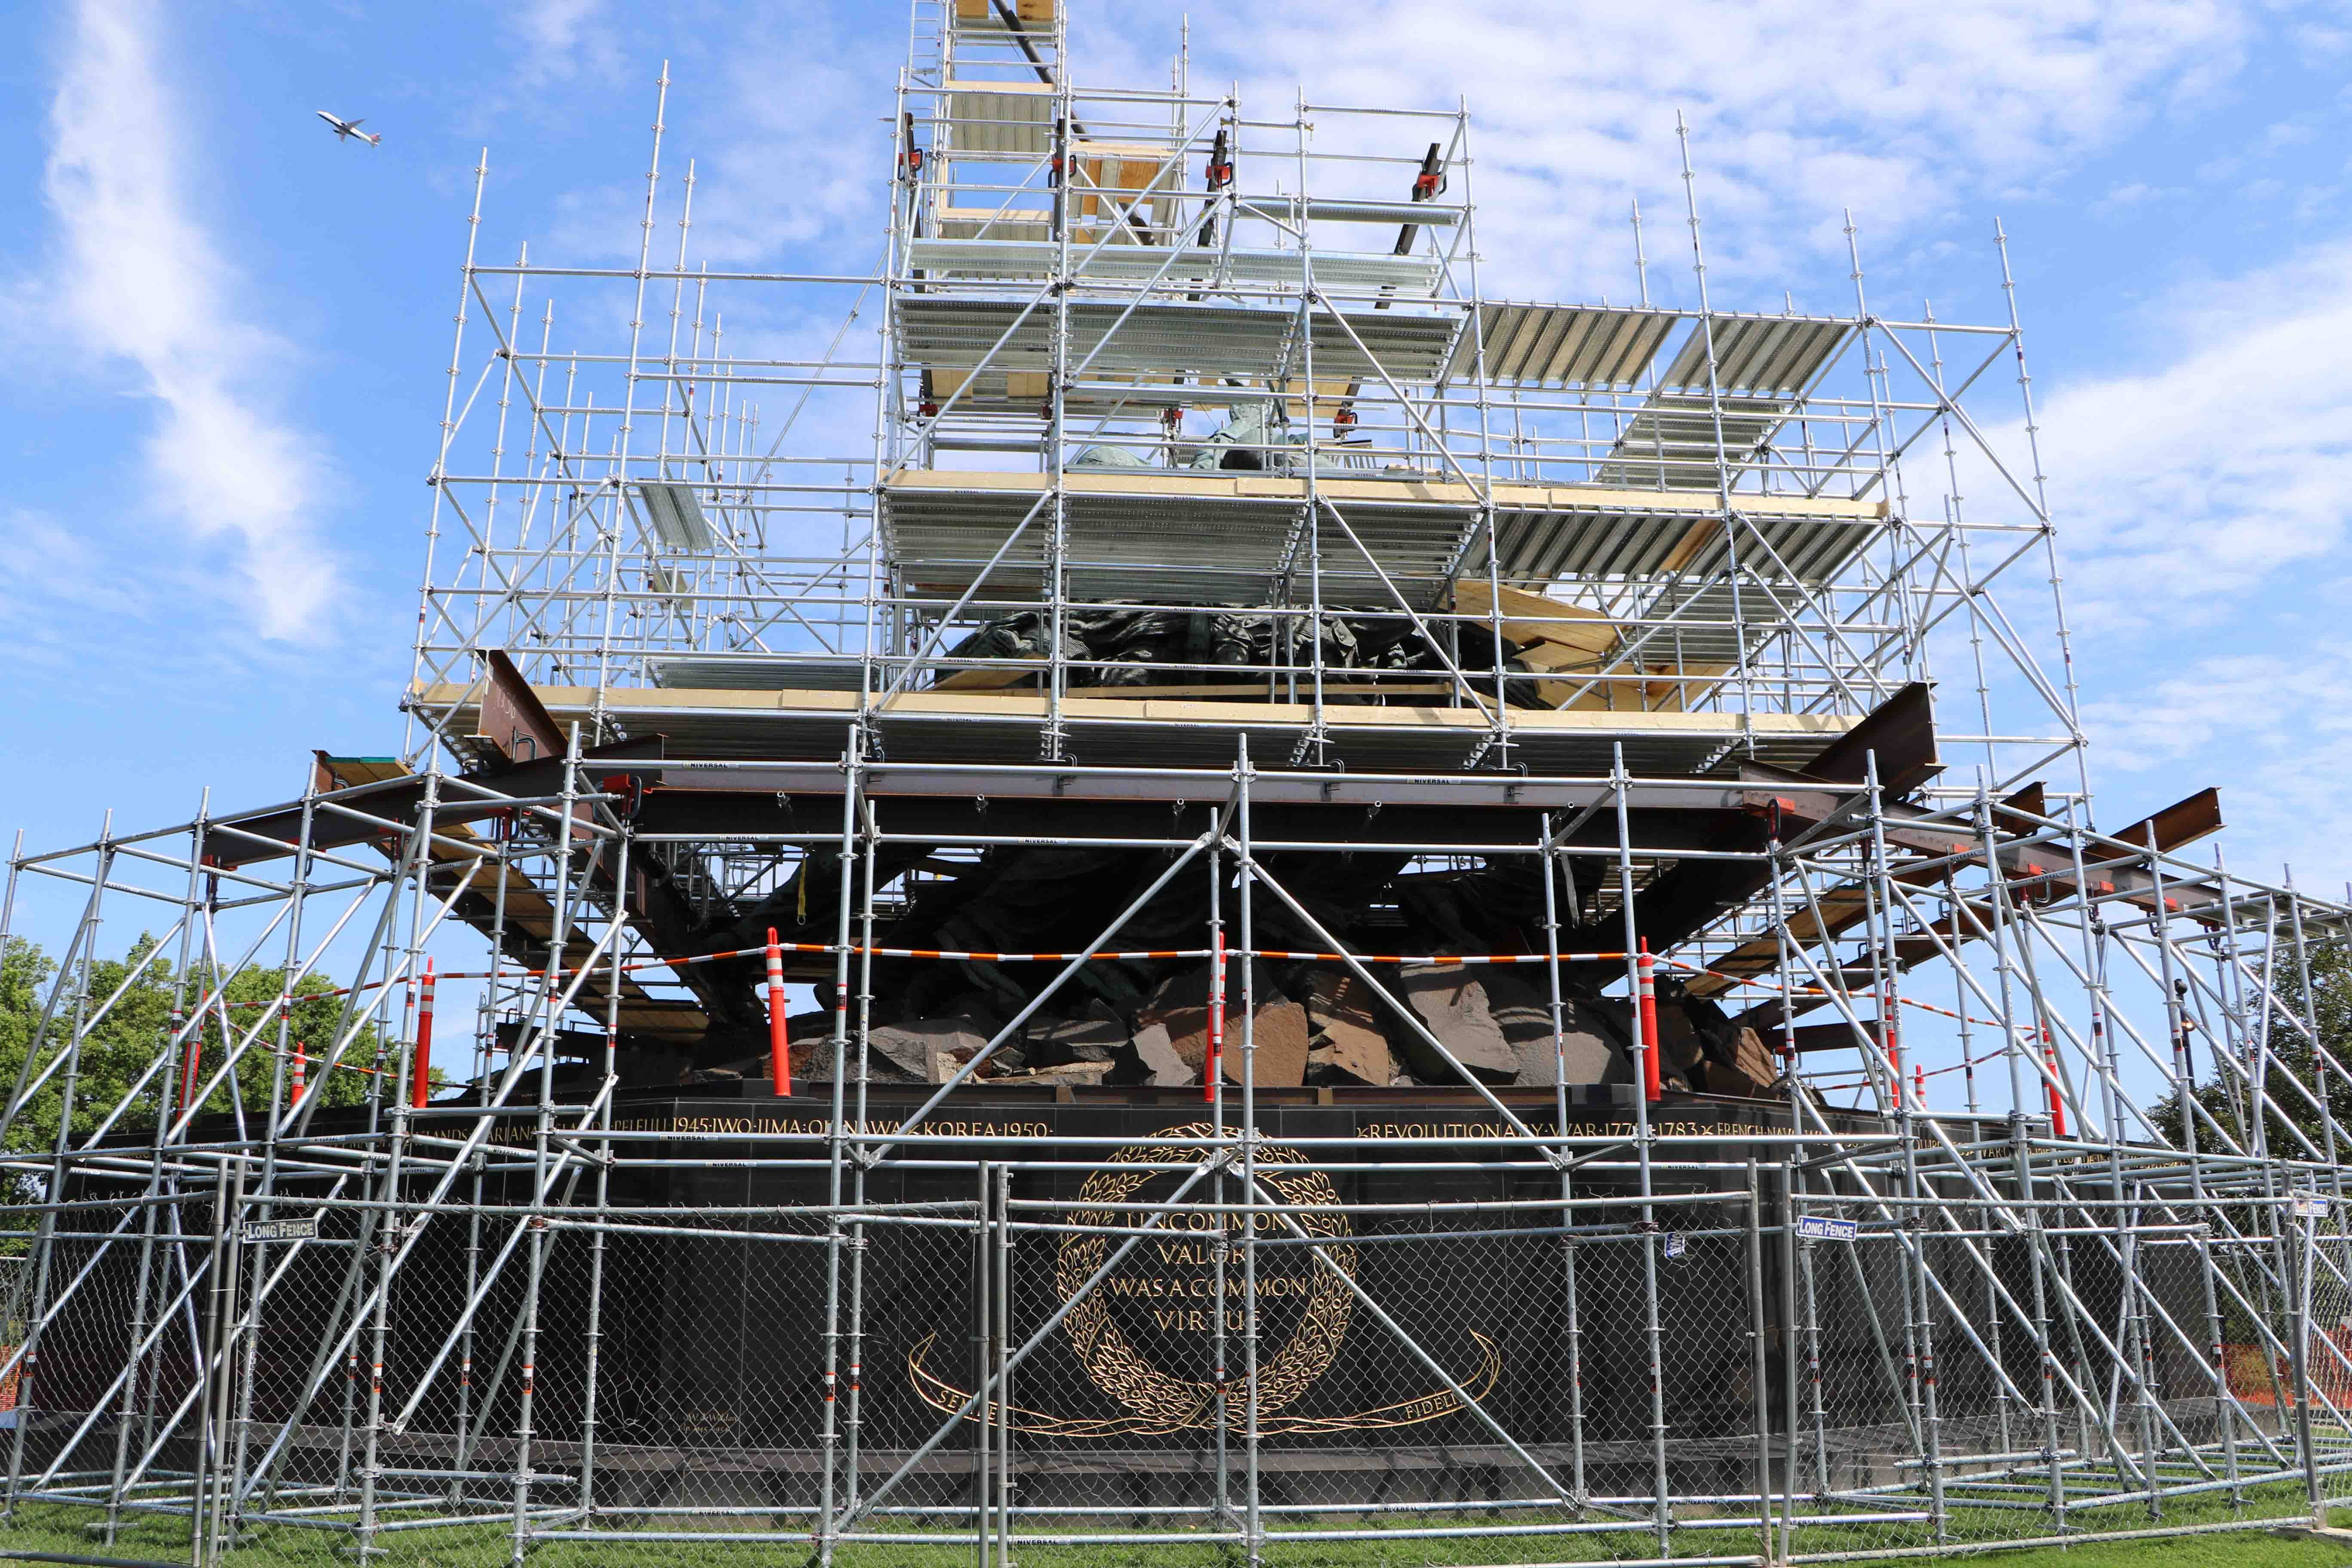 U S  Marine Corps War Memorial Rehabilitation - George Washington